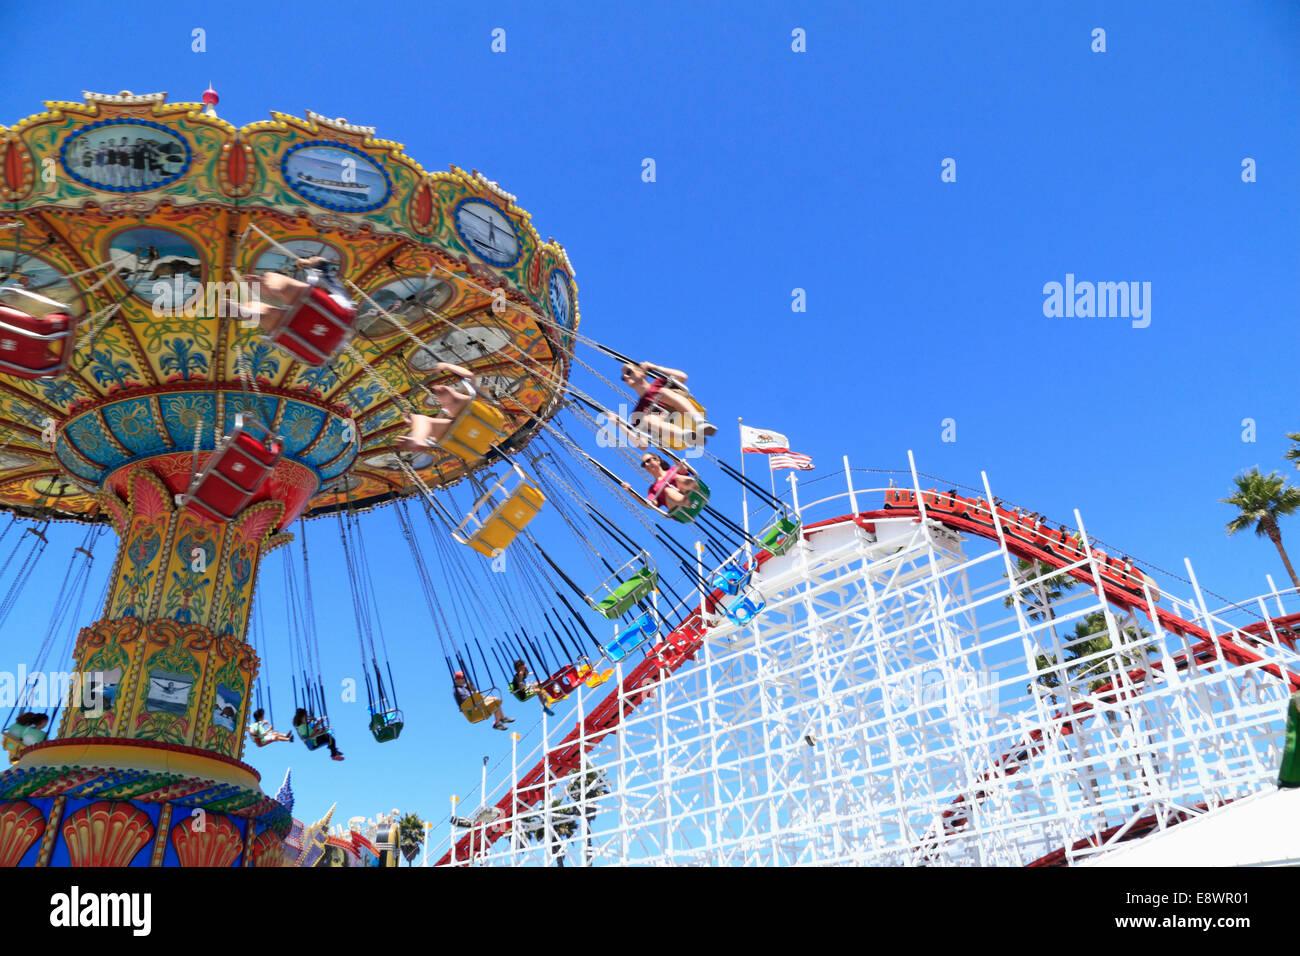 Wooden Roller coaster at Boardwalk amusement Park ,  Santa Cruz near San Francisco, California, USA Stock Photo